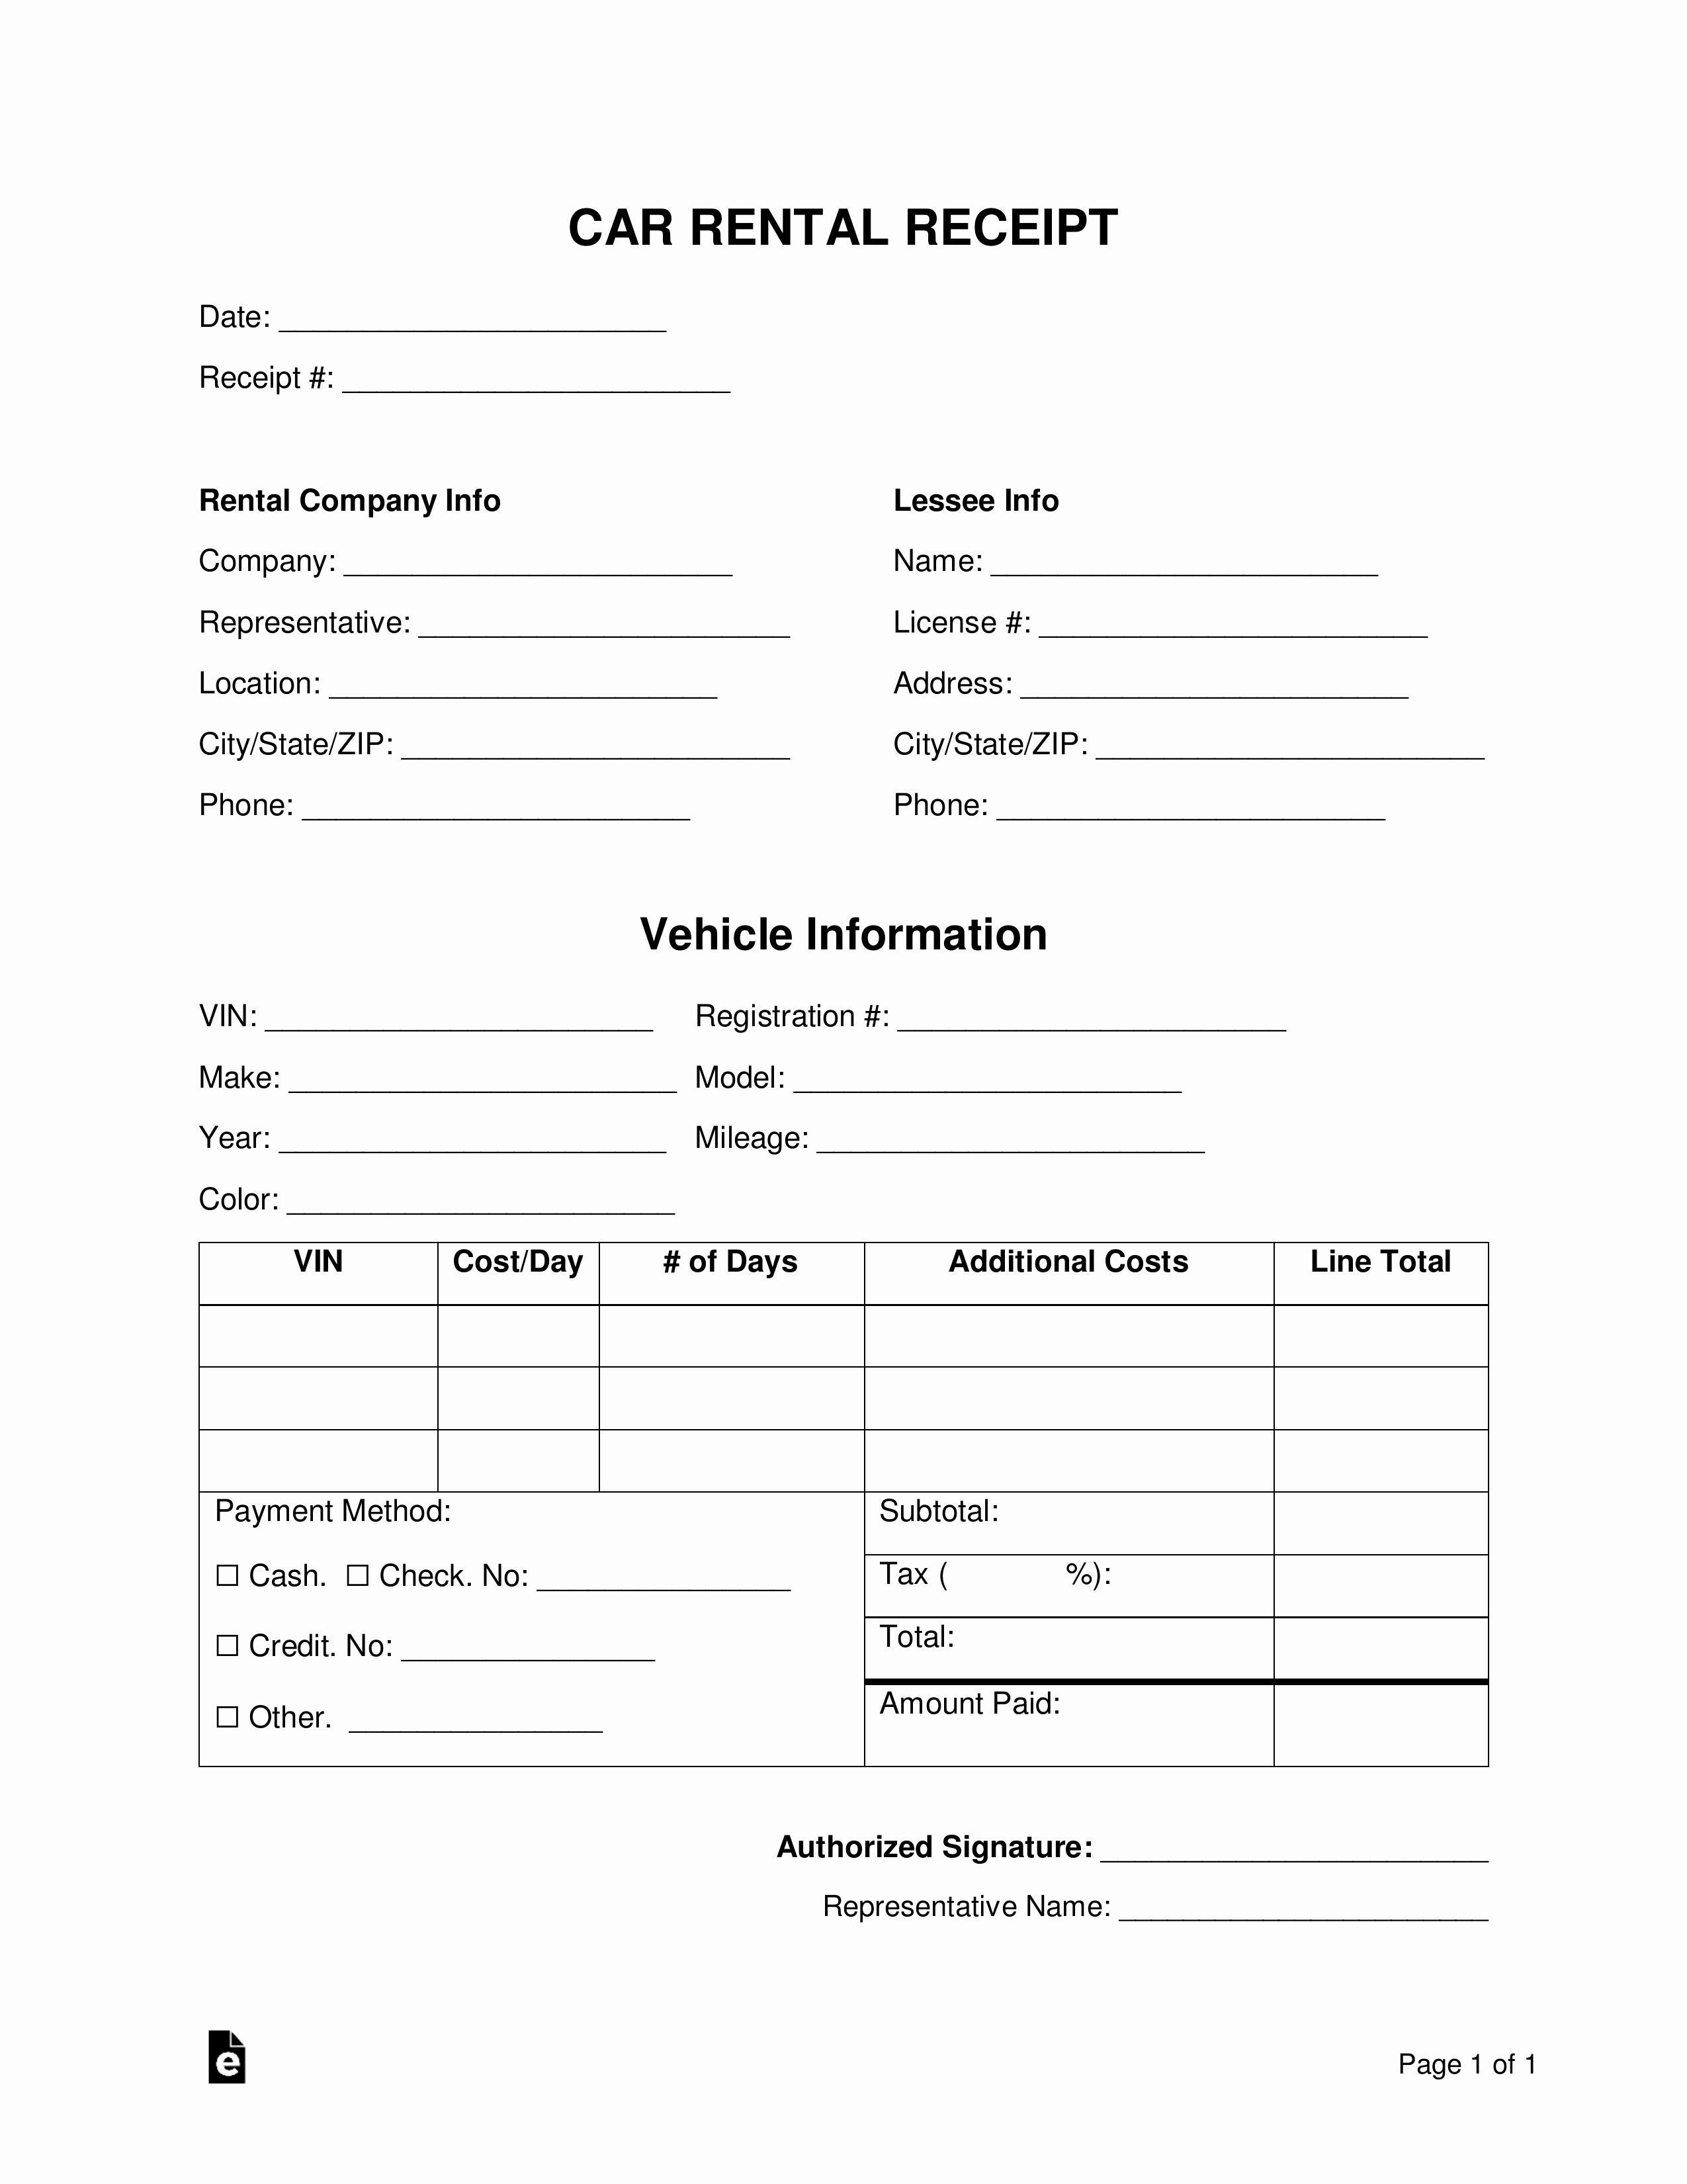 Pdf Car Rental Receipt Template